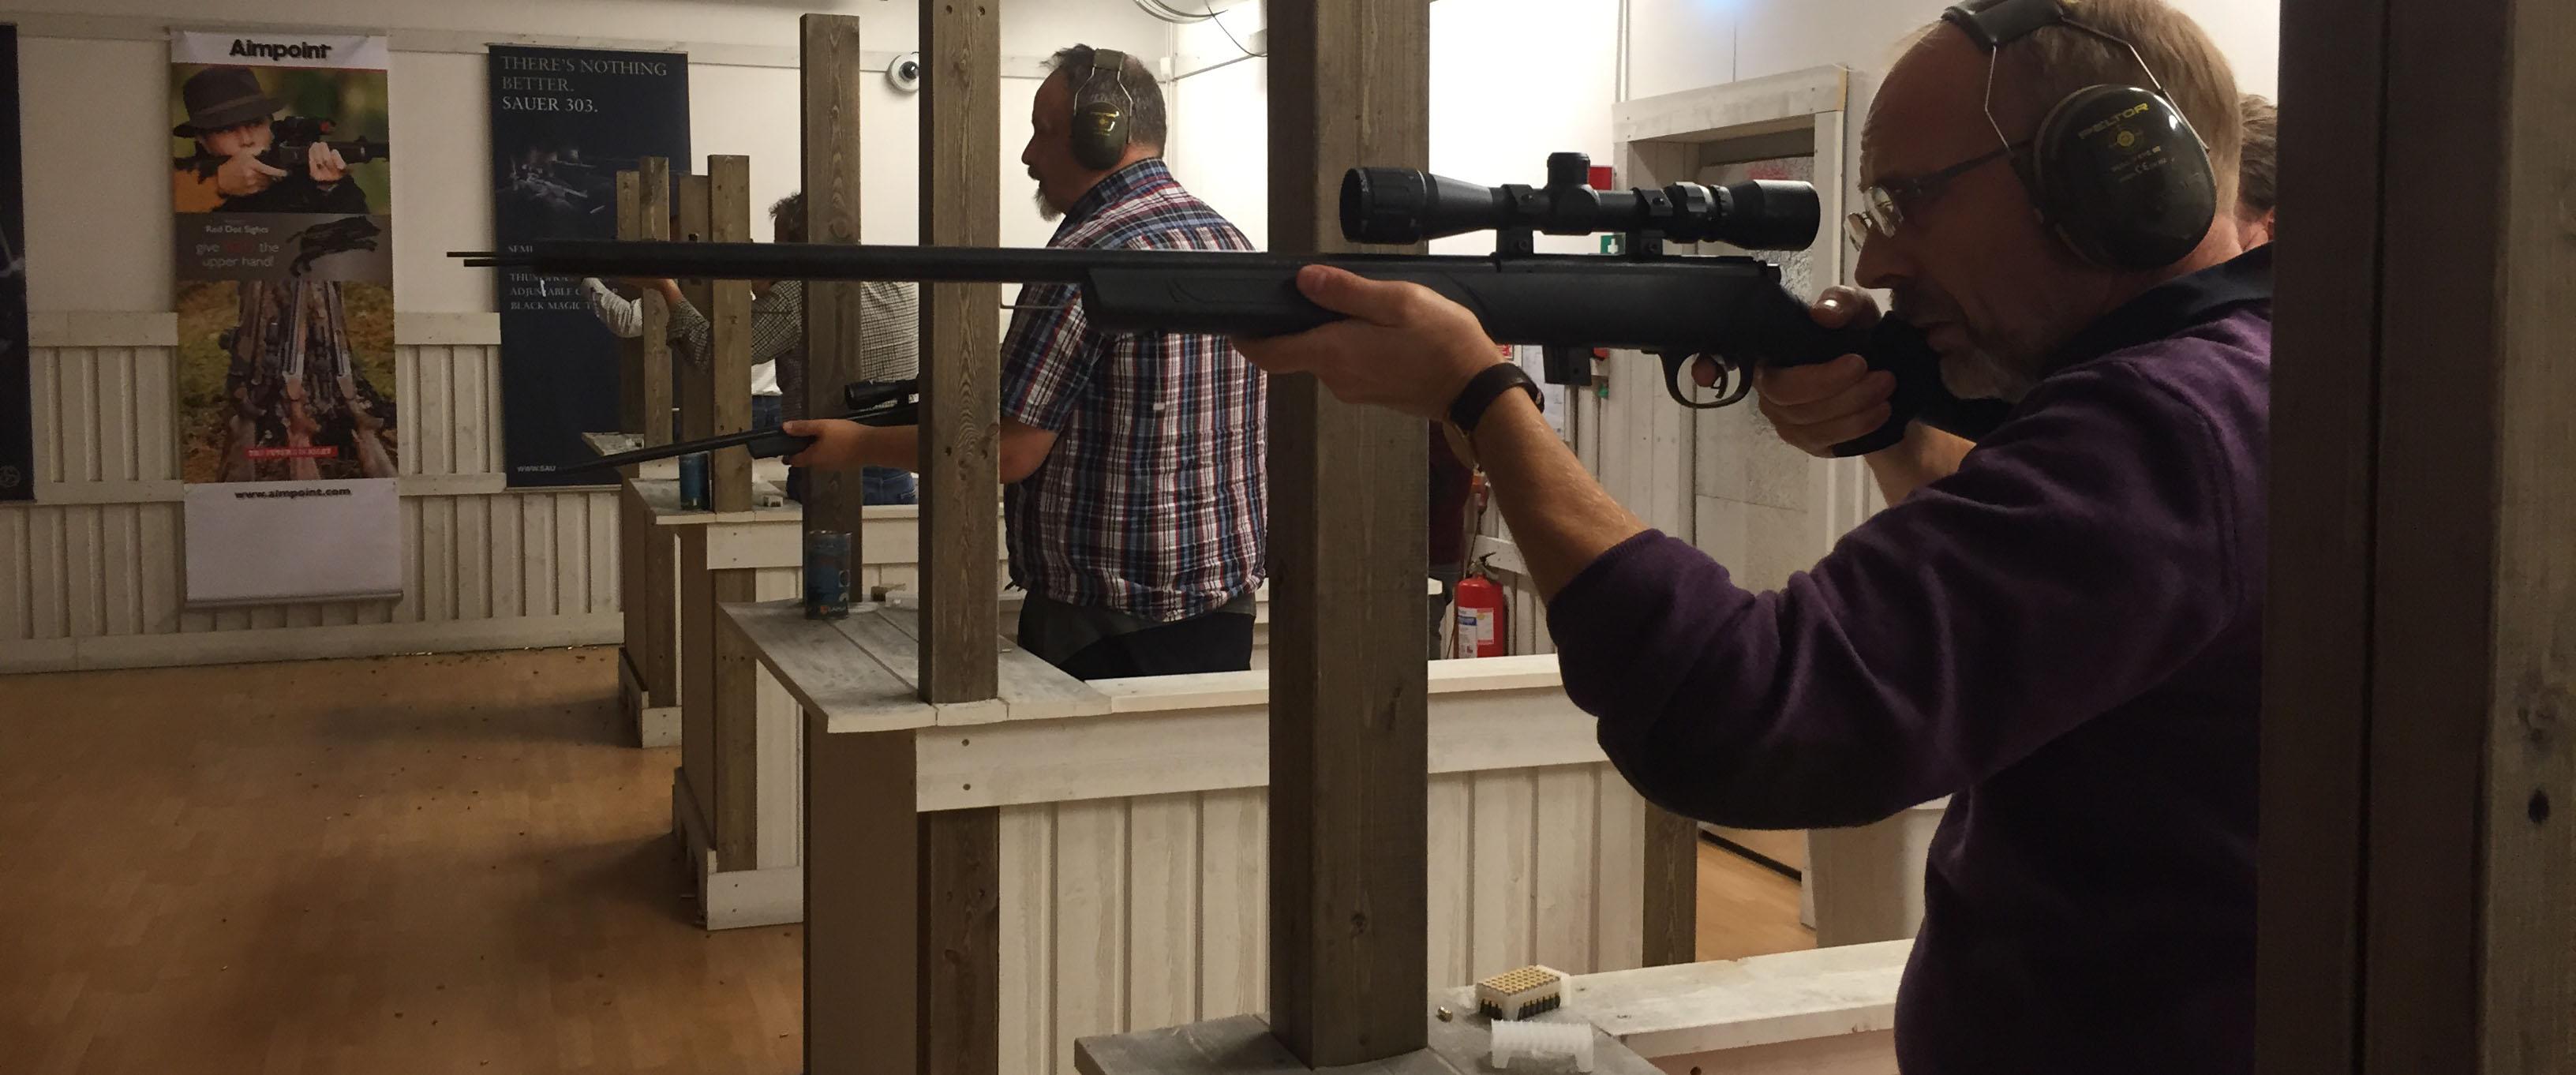 The shooting range cinema